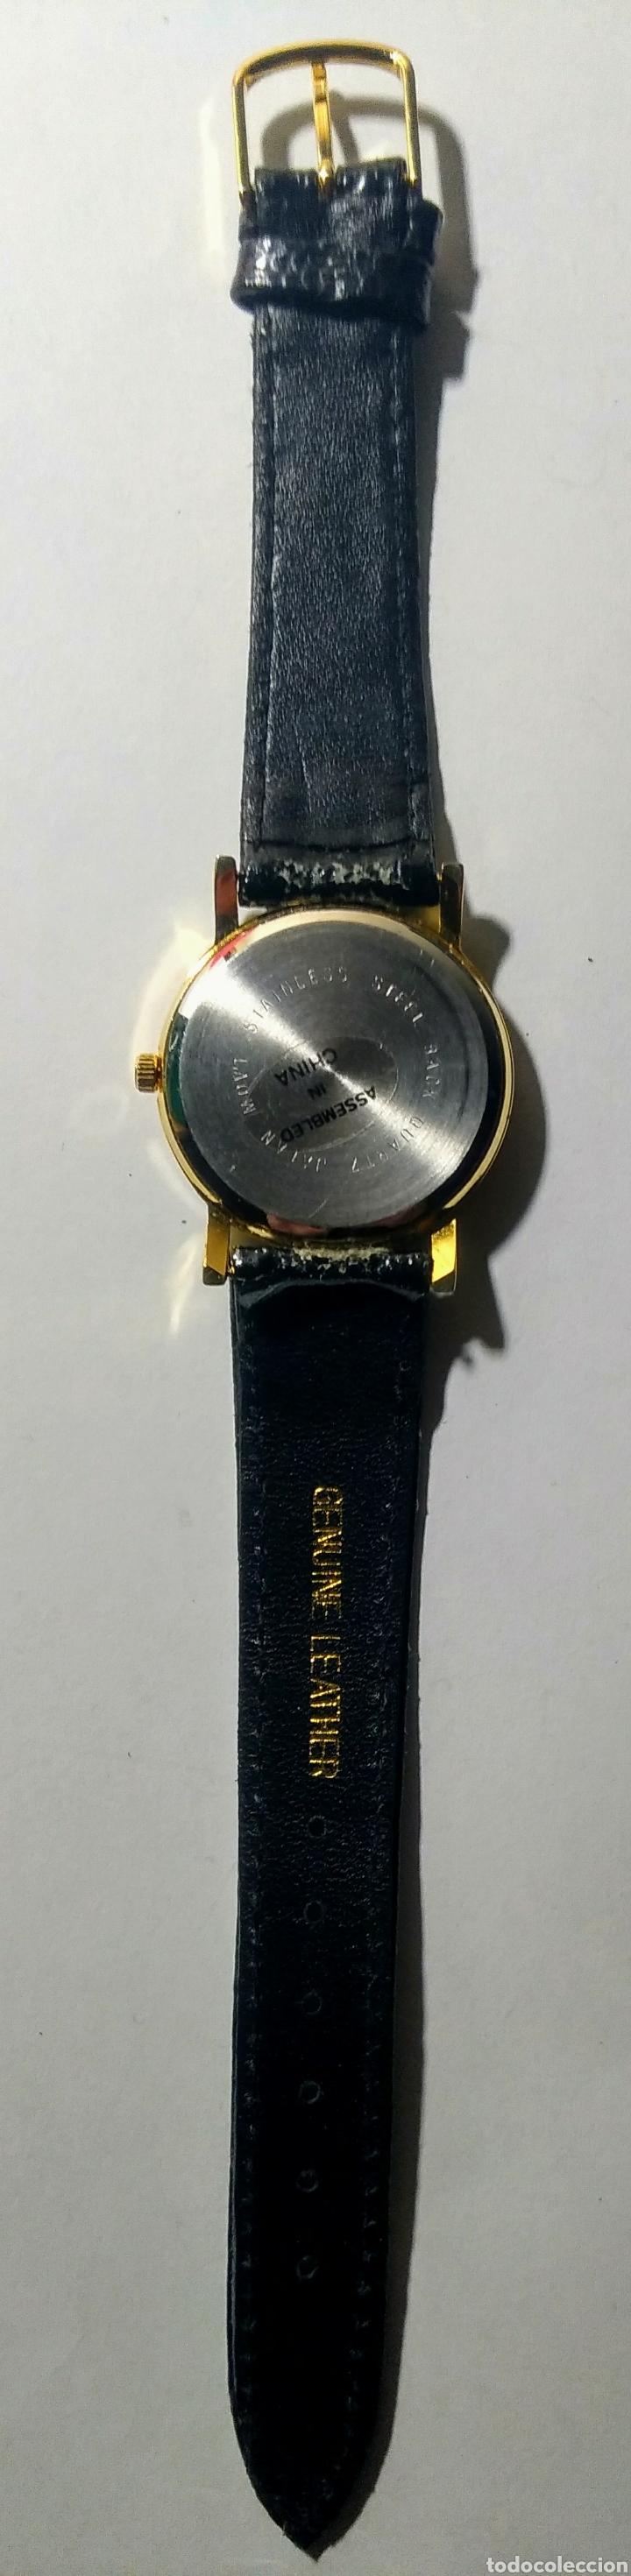 Relojes: Reloj Quartz. Japan Movt. Correa de piel. - Foto 3 - 187543792